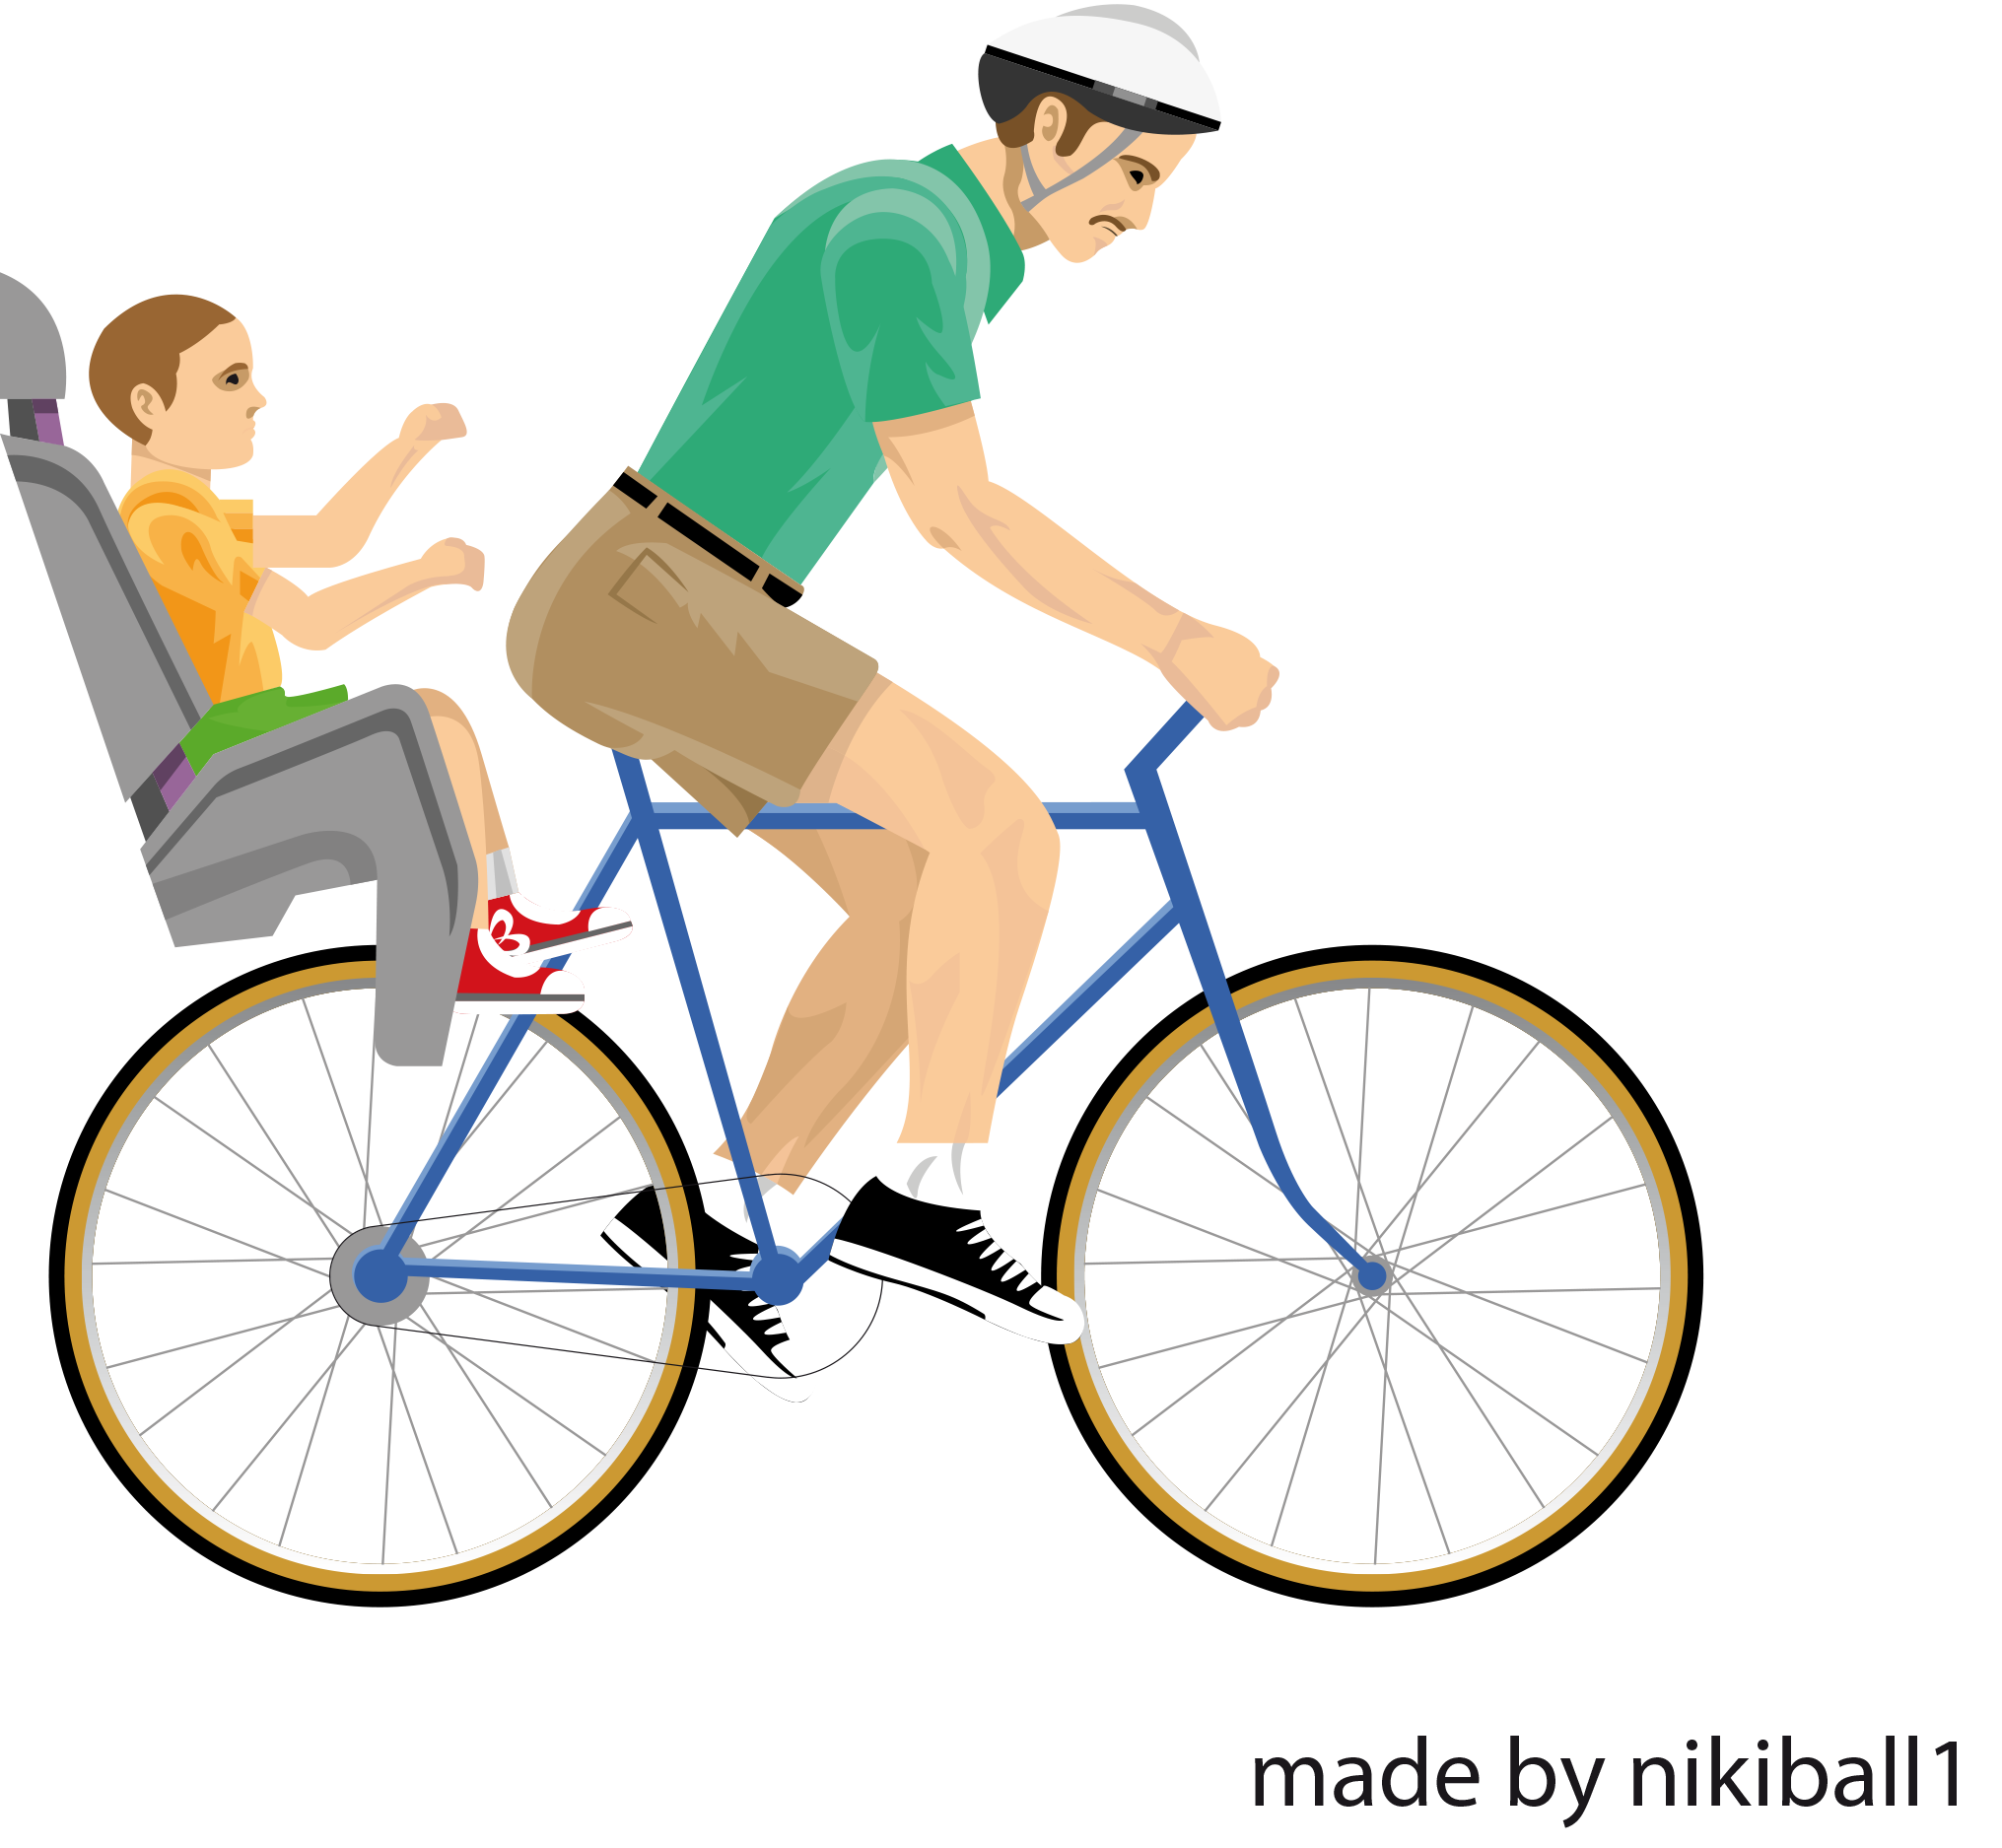 Happy wheels - Happy Wheels 54